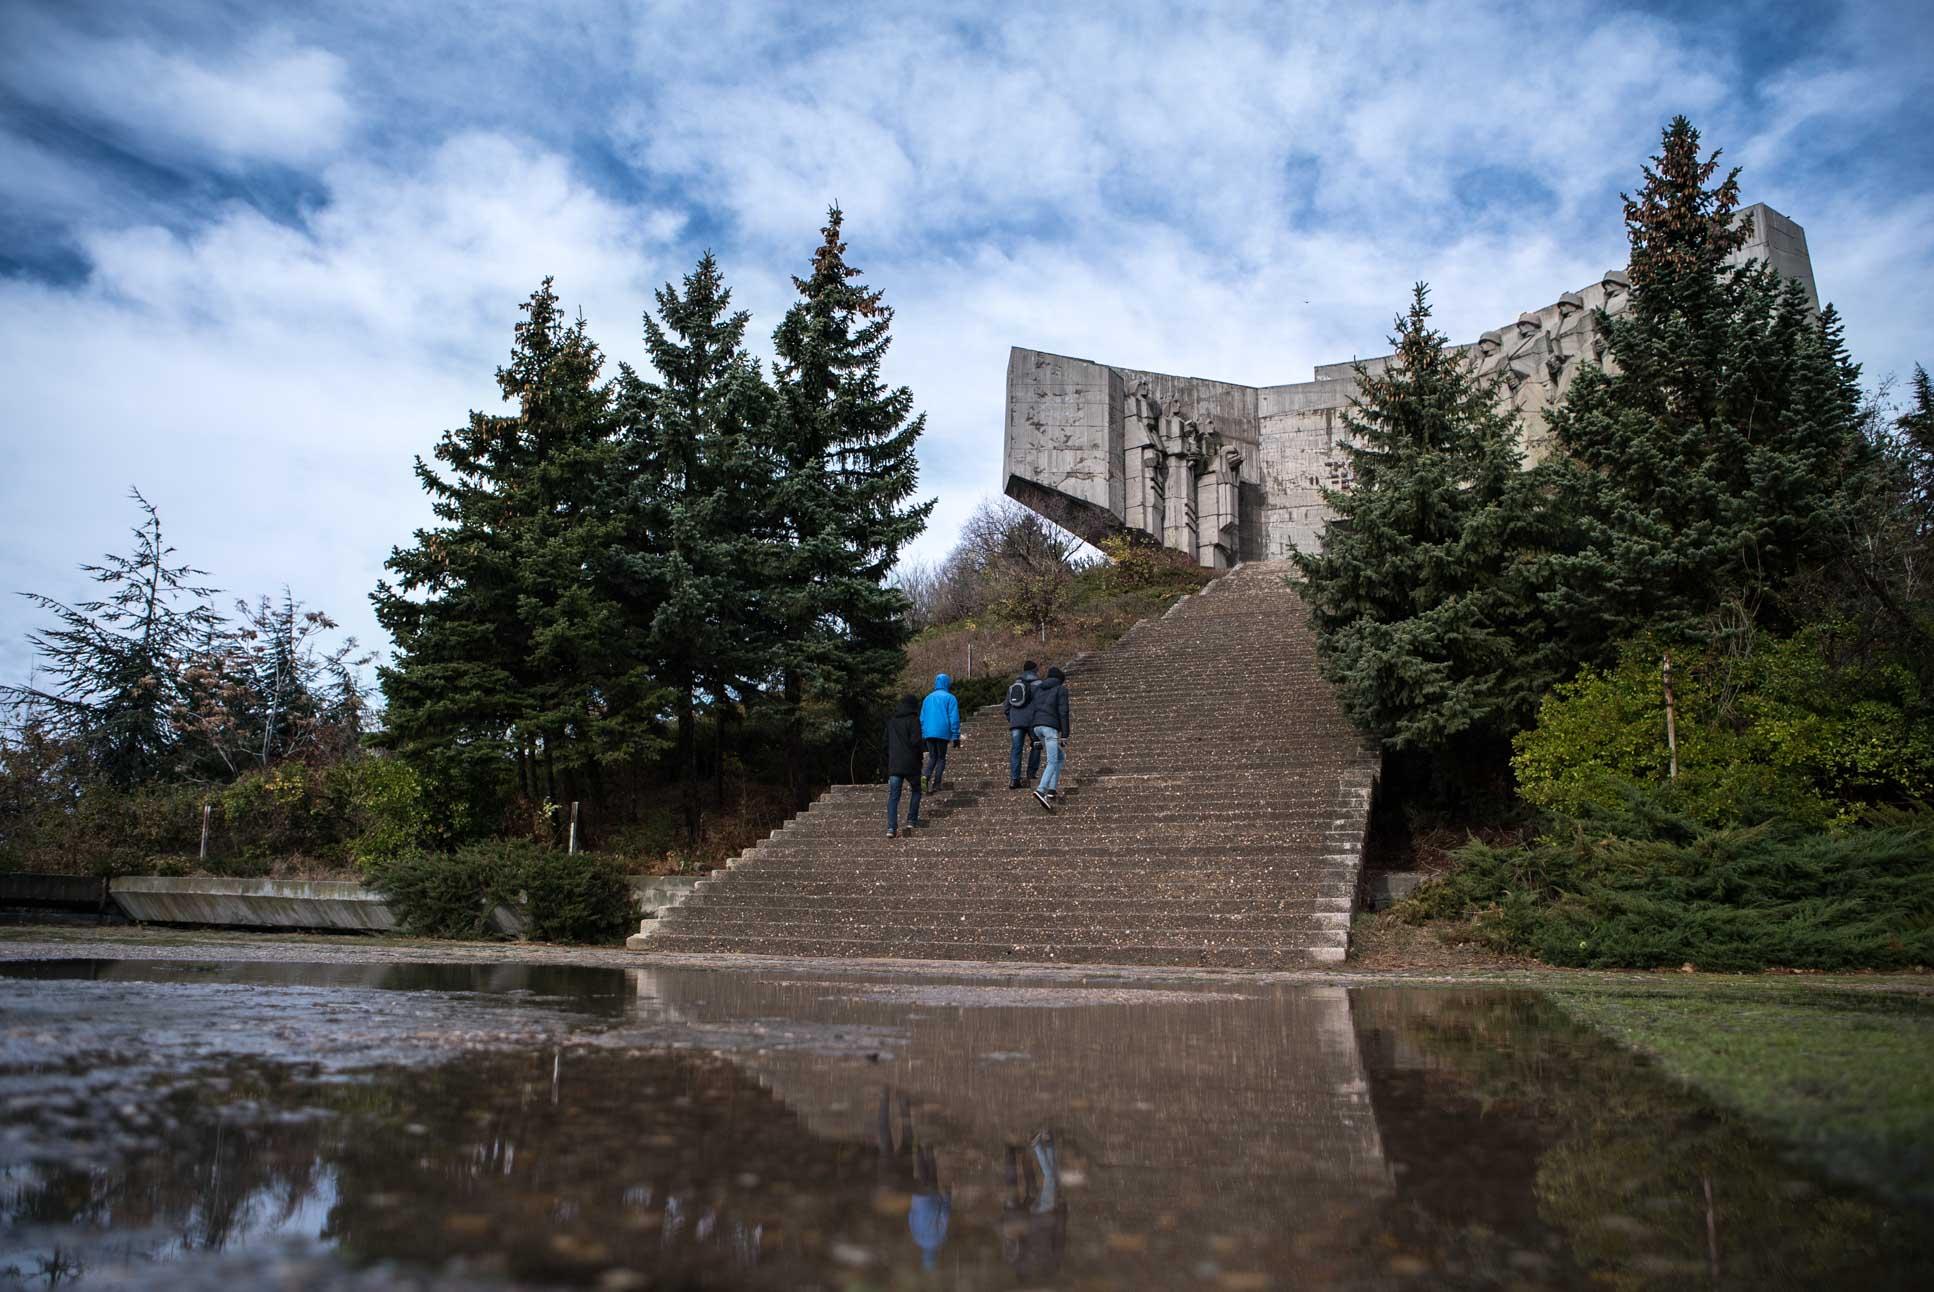 Photo by Pascal Sommer - Парк-паметник на българо-съветската дружба